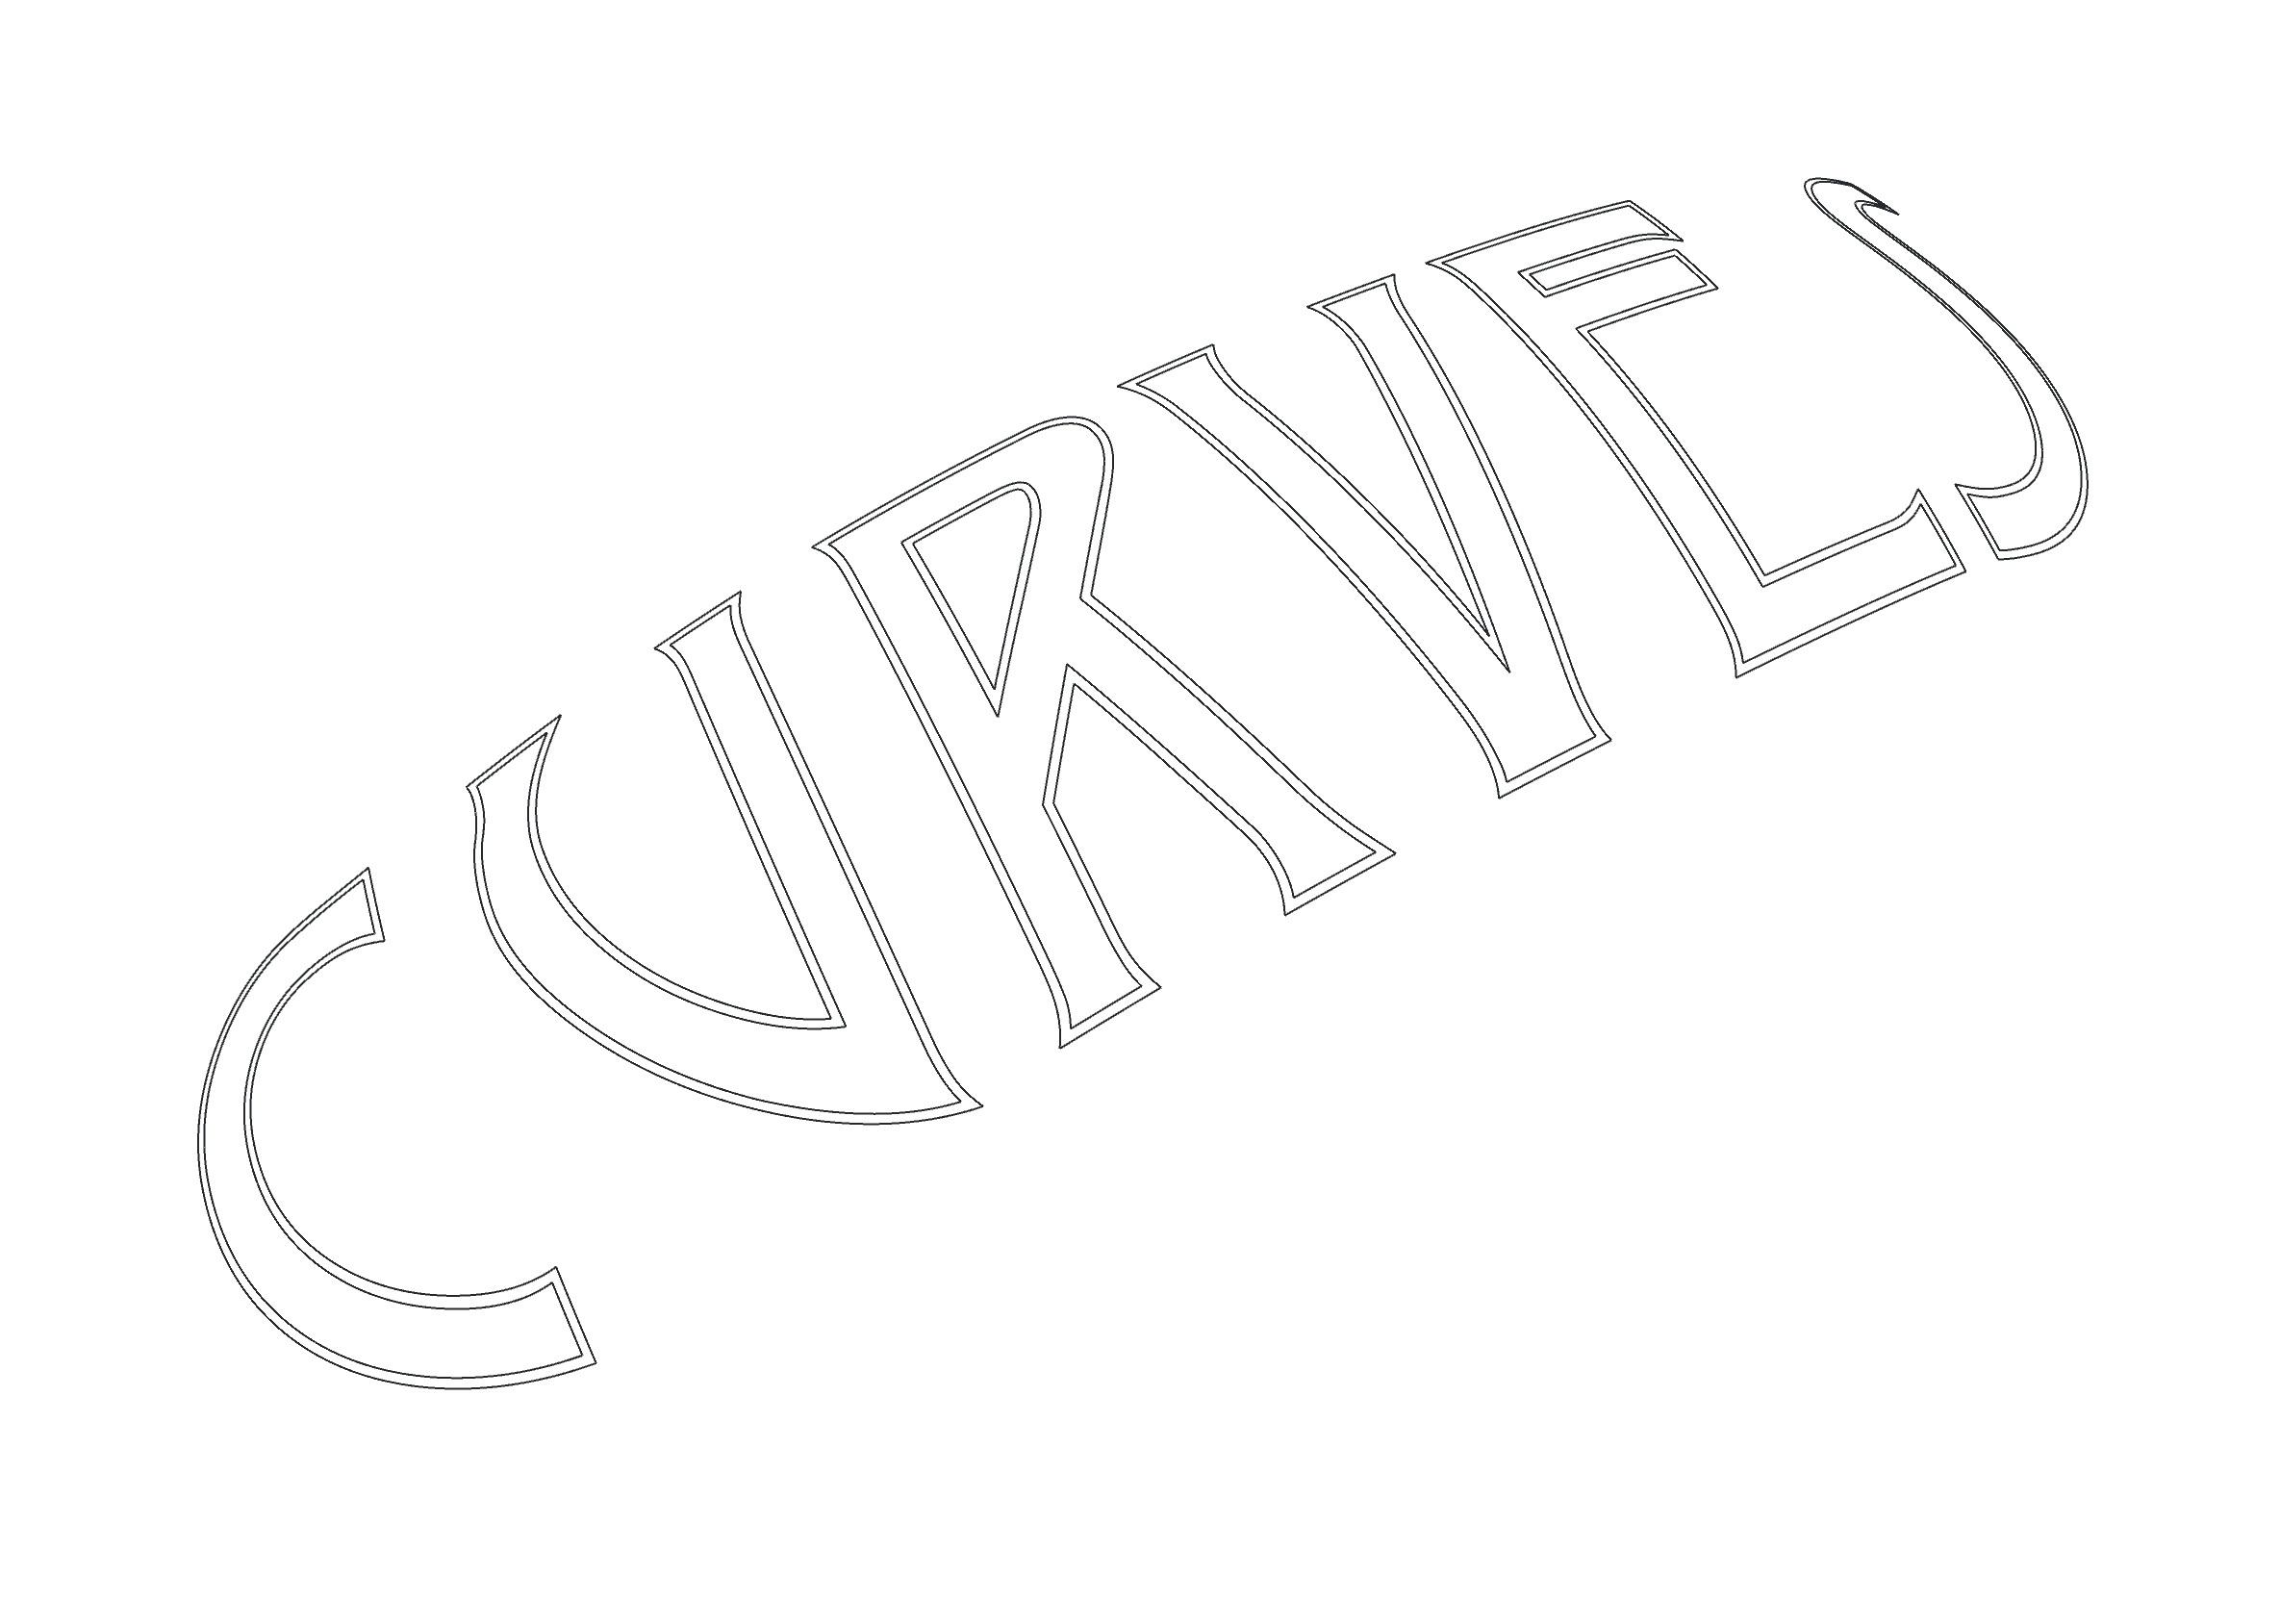 Curves_image_01.jpg